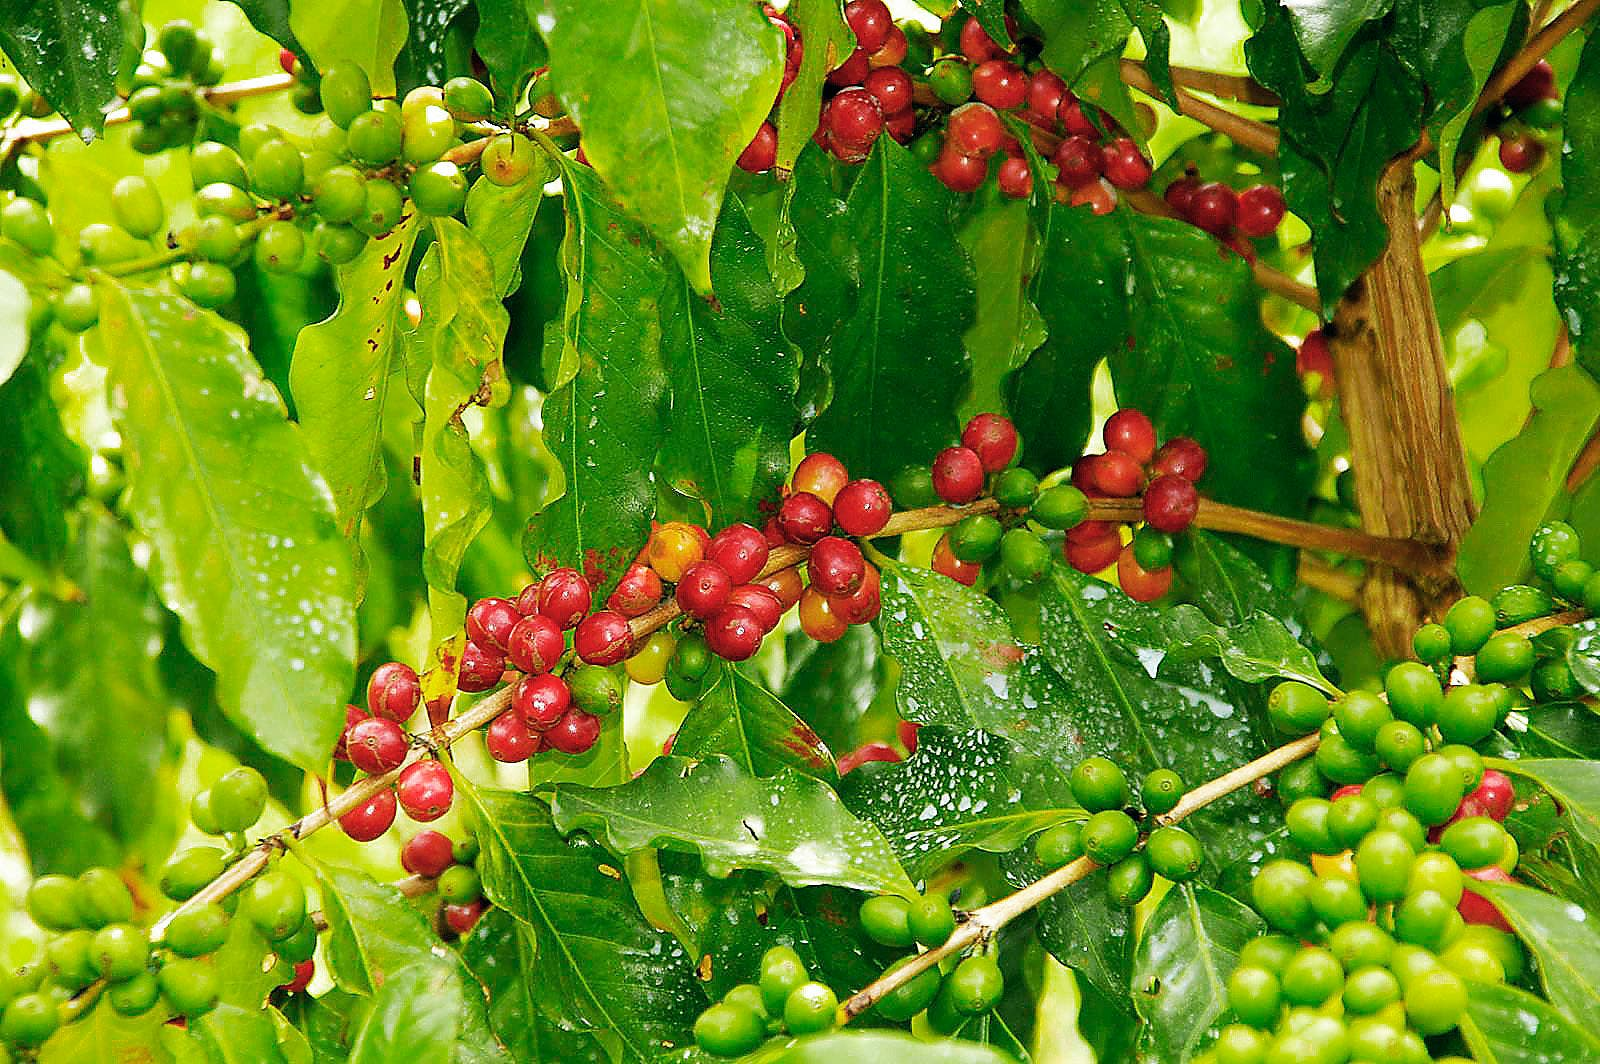 Starbucks to help local coffee farmers